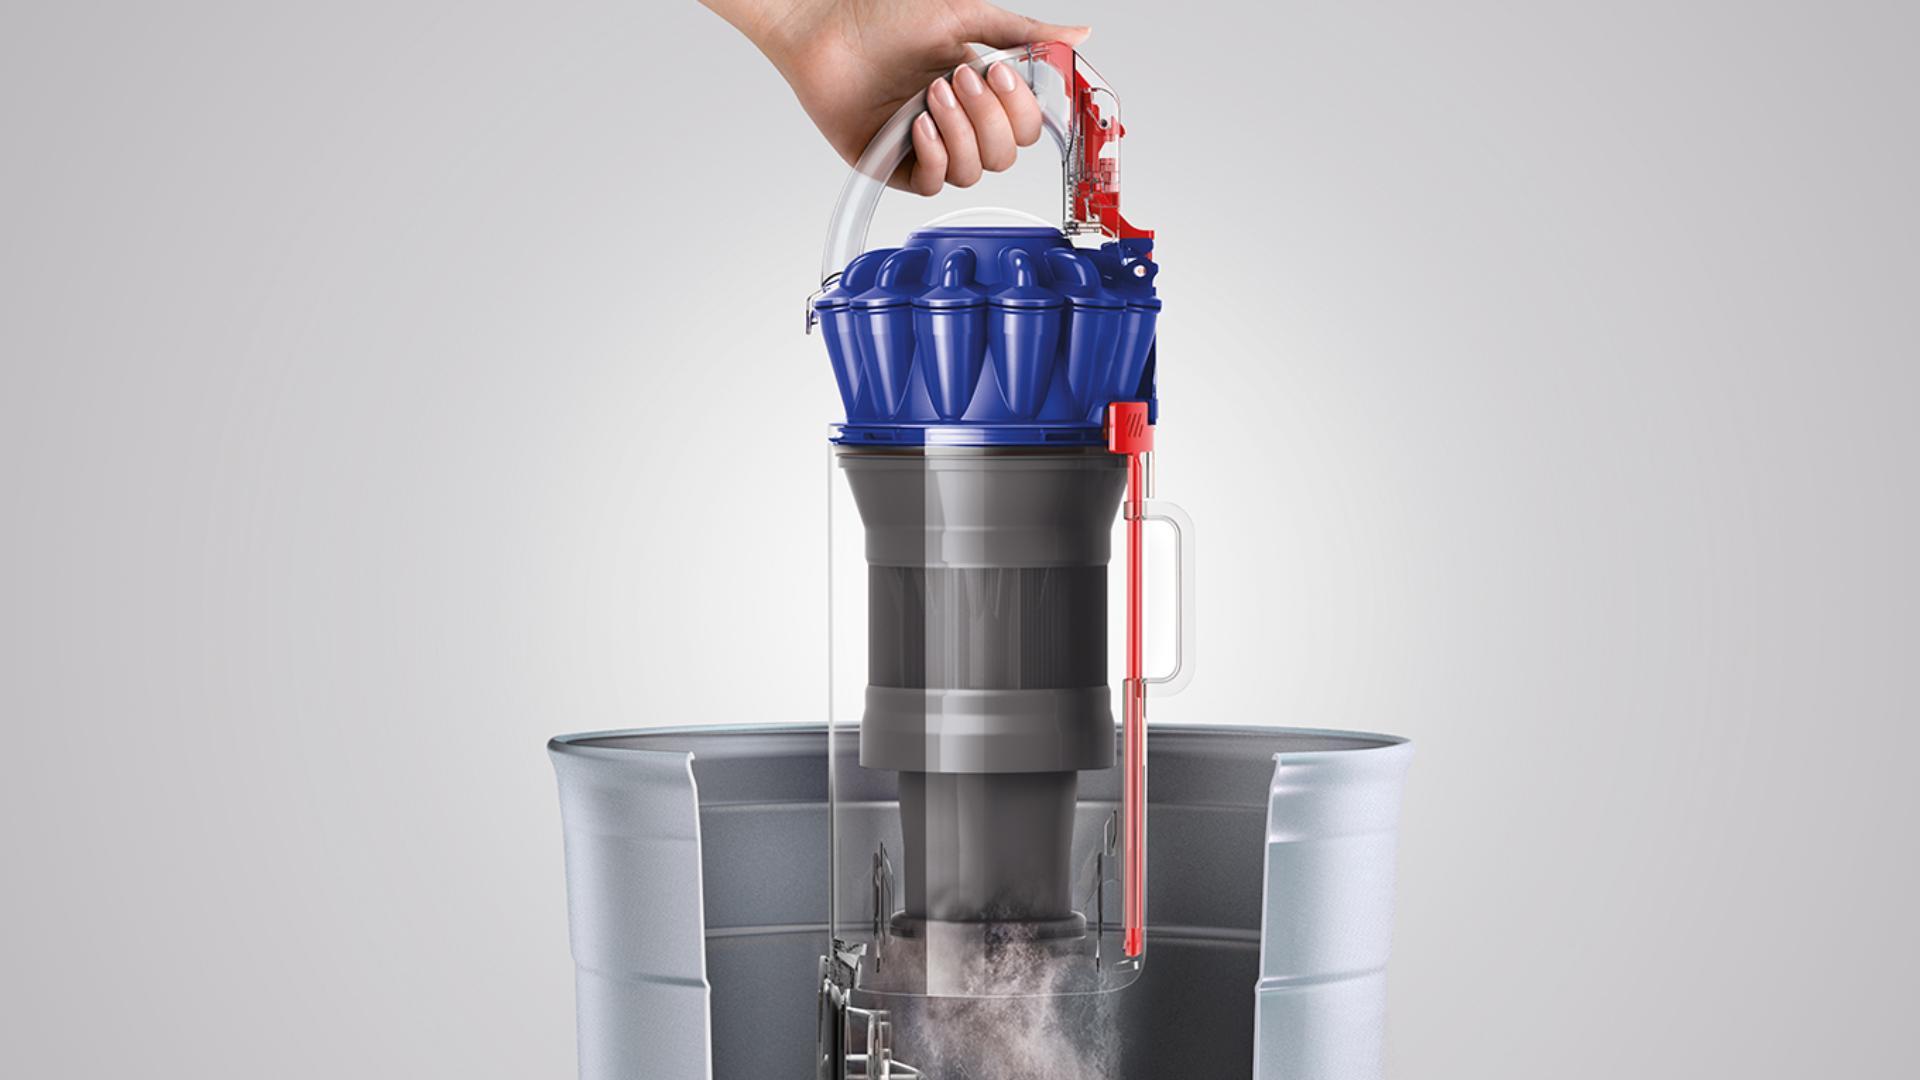 One-click hygienic bin emptying icon